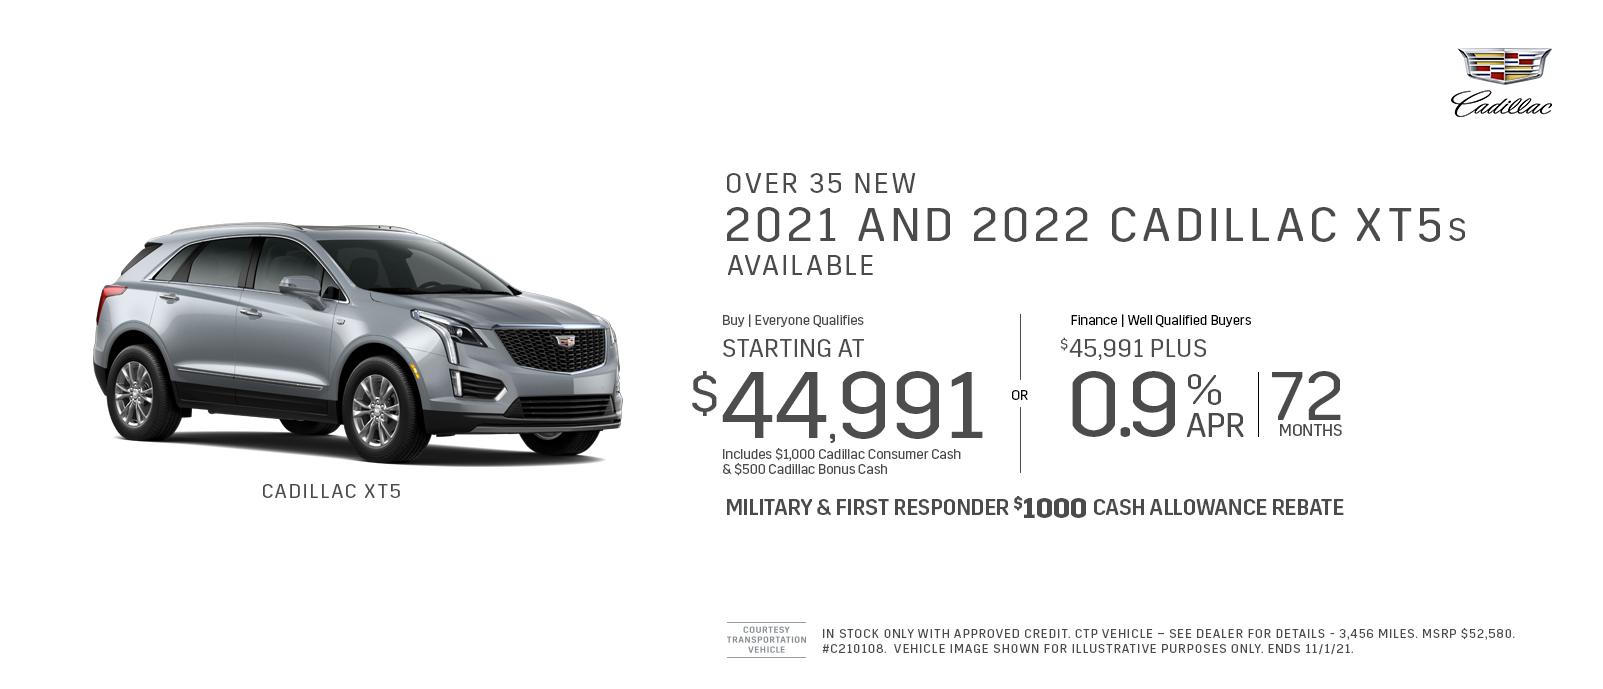 35-New-2021-XT5s-Available